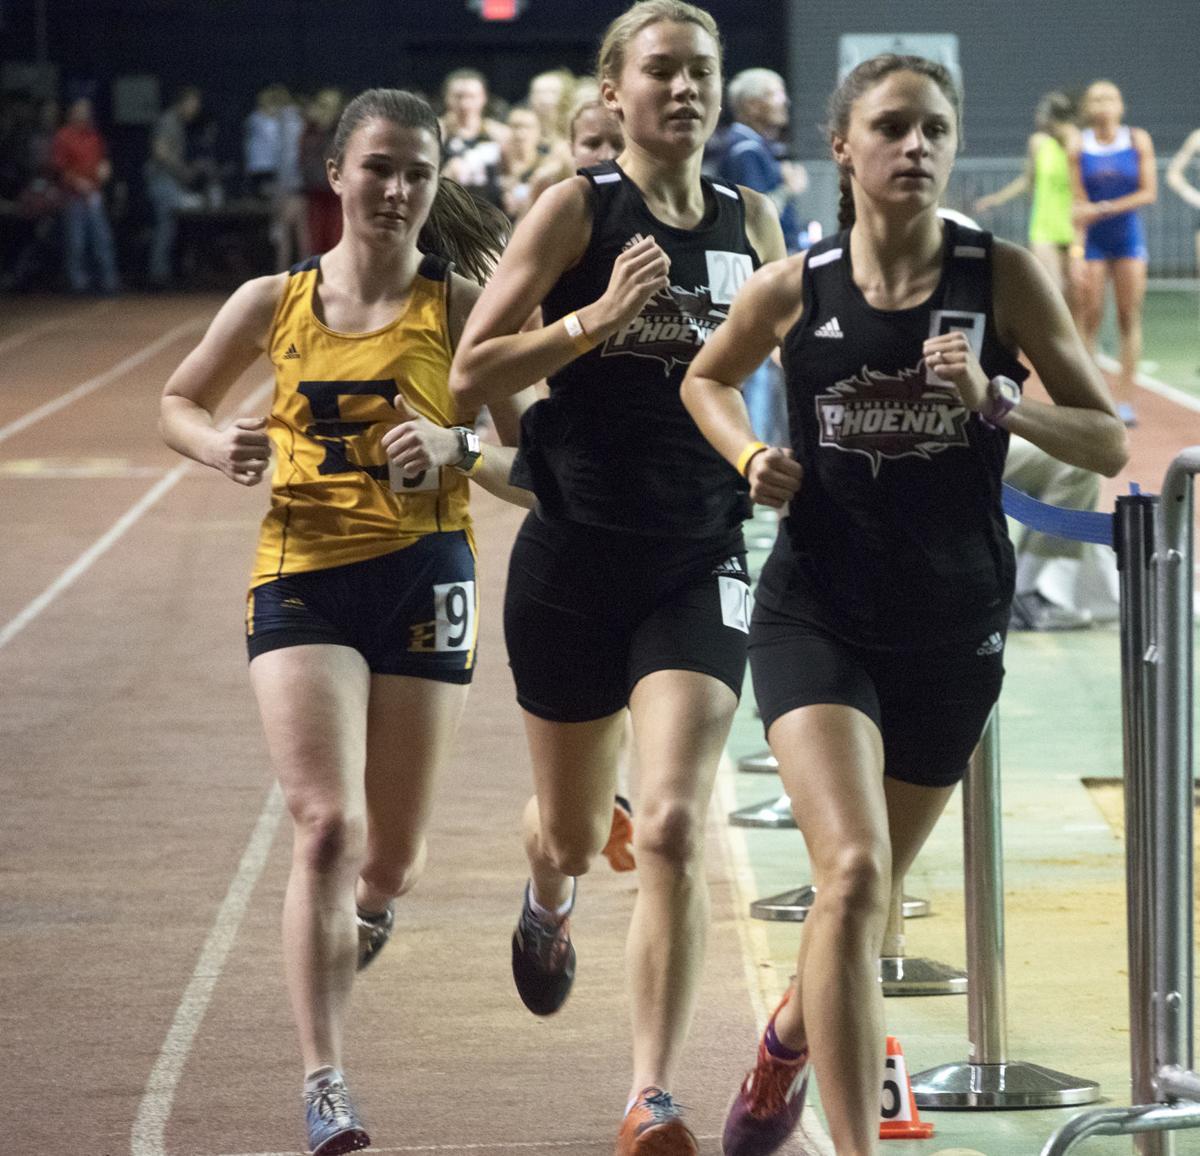 Feuchtenburger win highlights Bucs' day one efforts